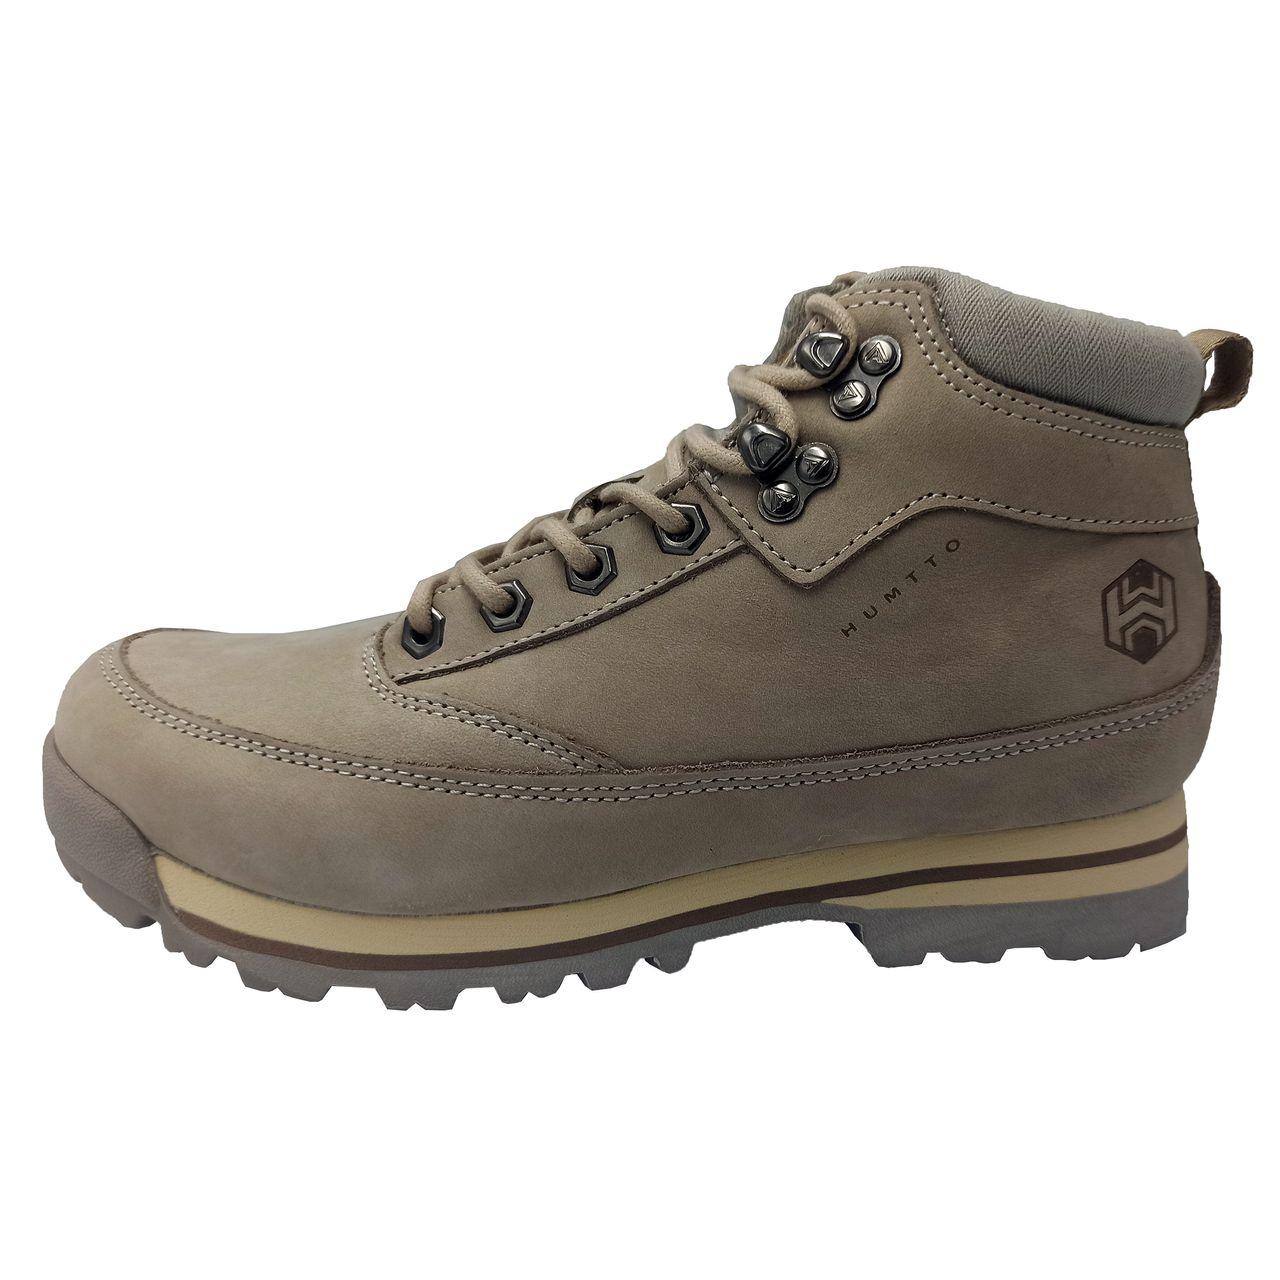 کفش کوهنوردی زنانه هامتو مدل 210568B-3